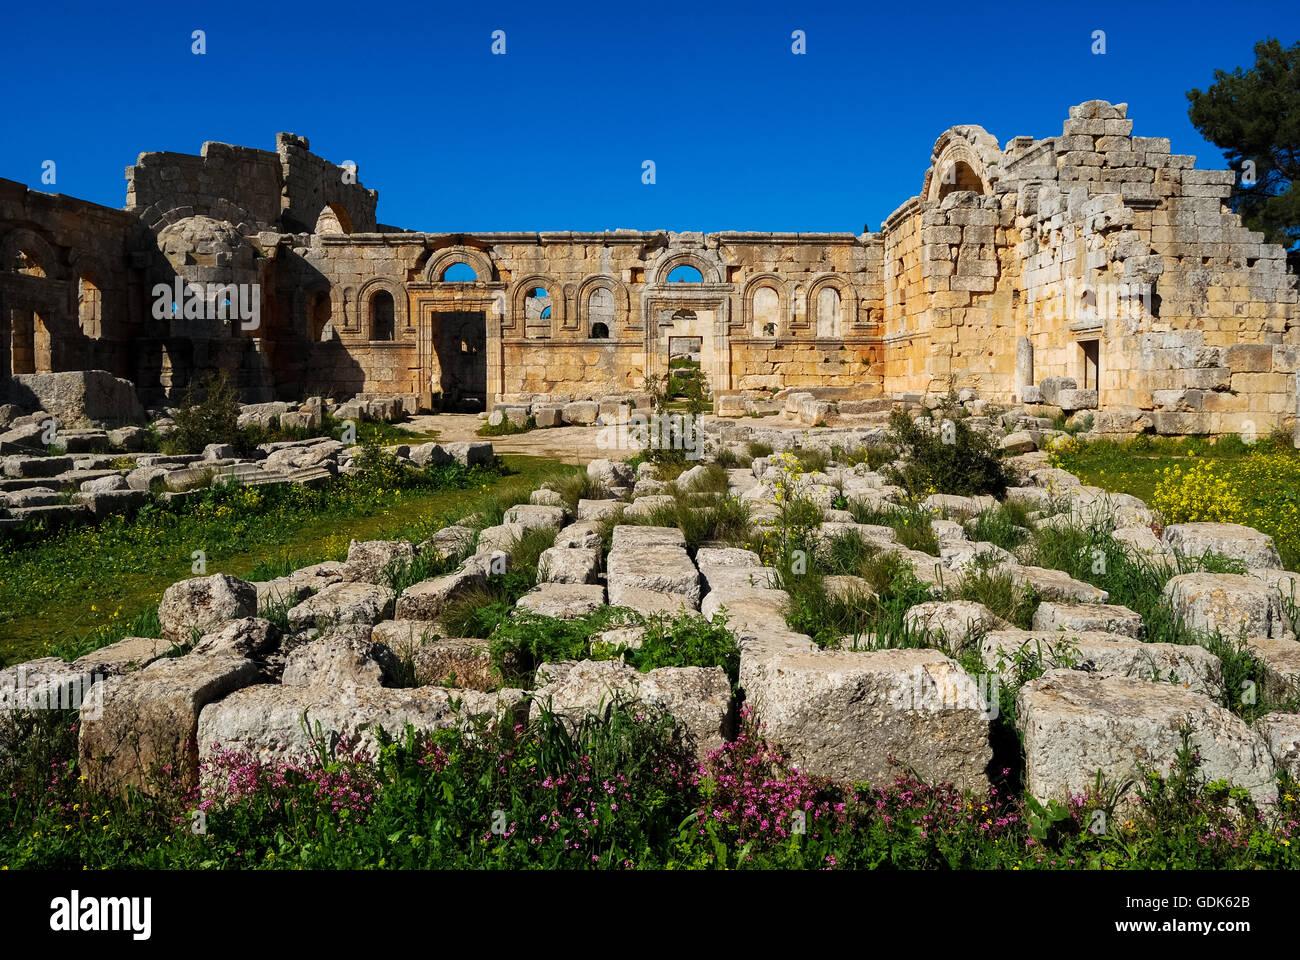 Church of Saint Simeon Stylites, northwest of Aleppo, Syria, Middle East. Stock Photo